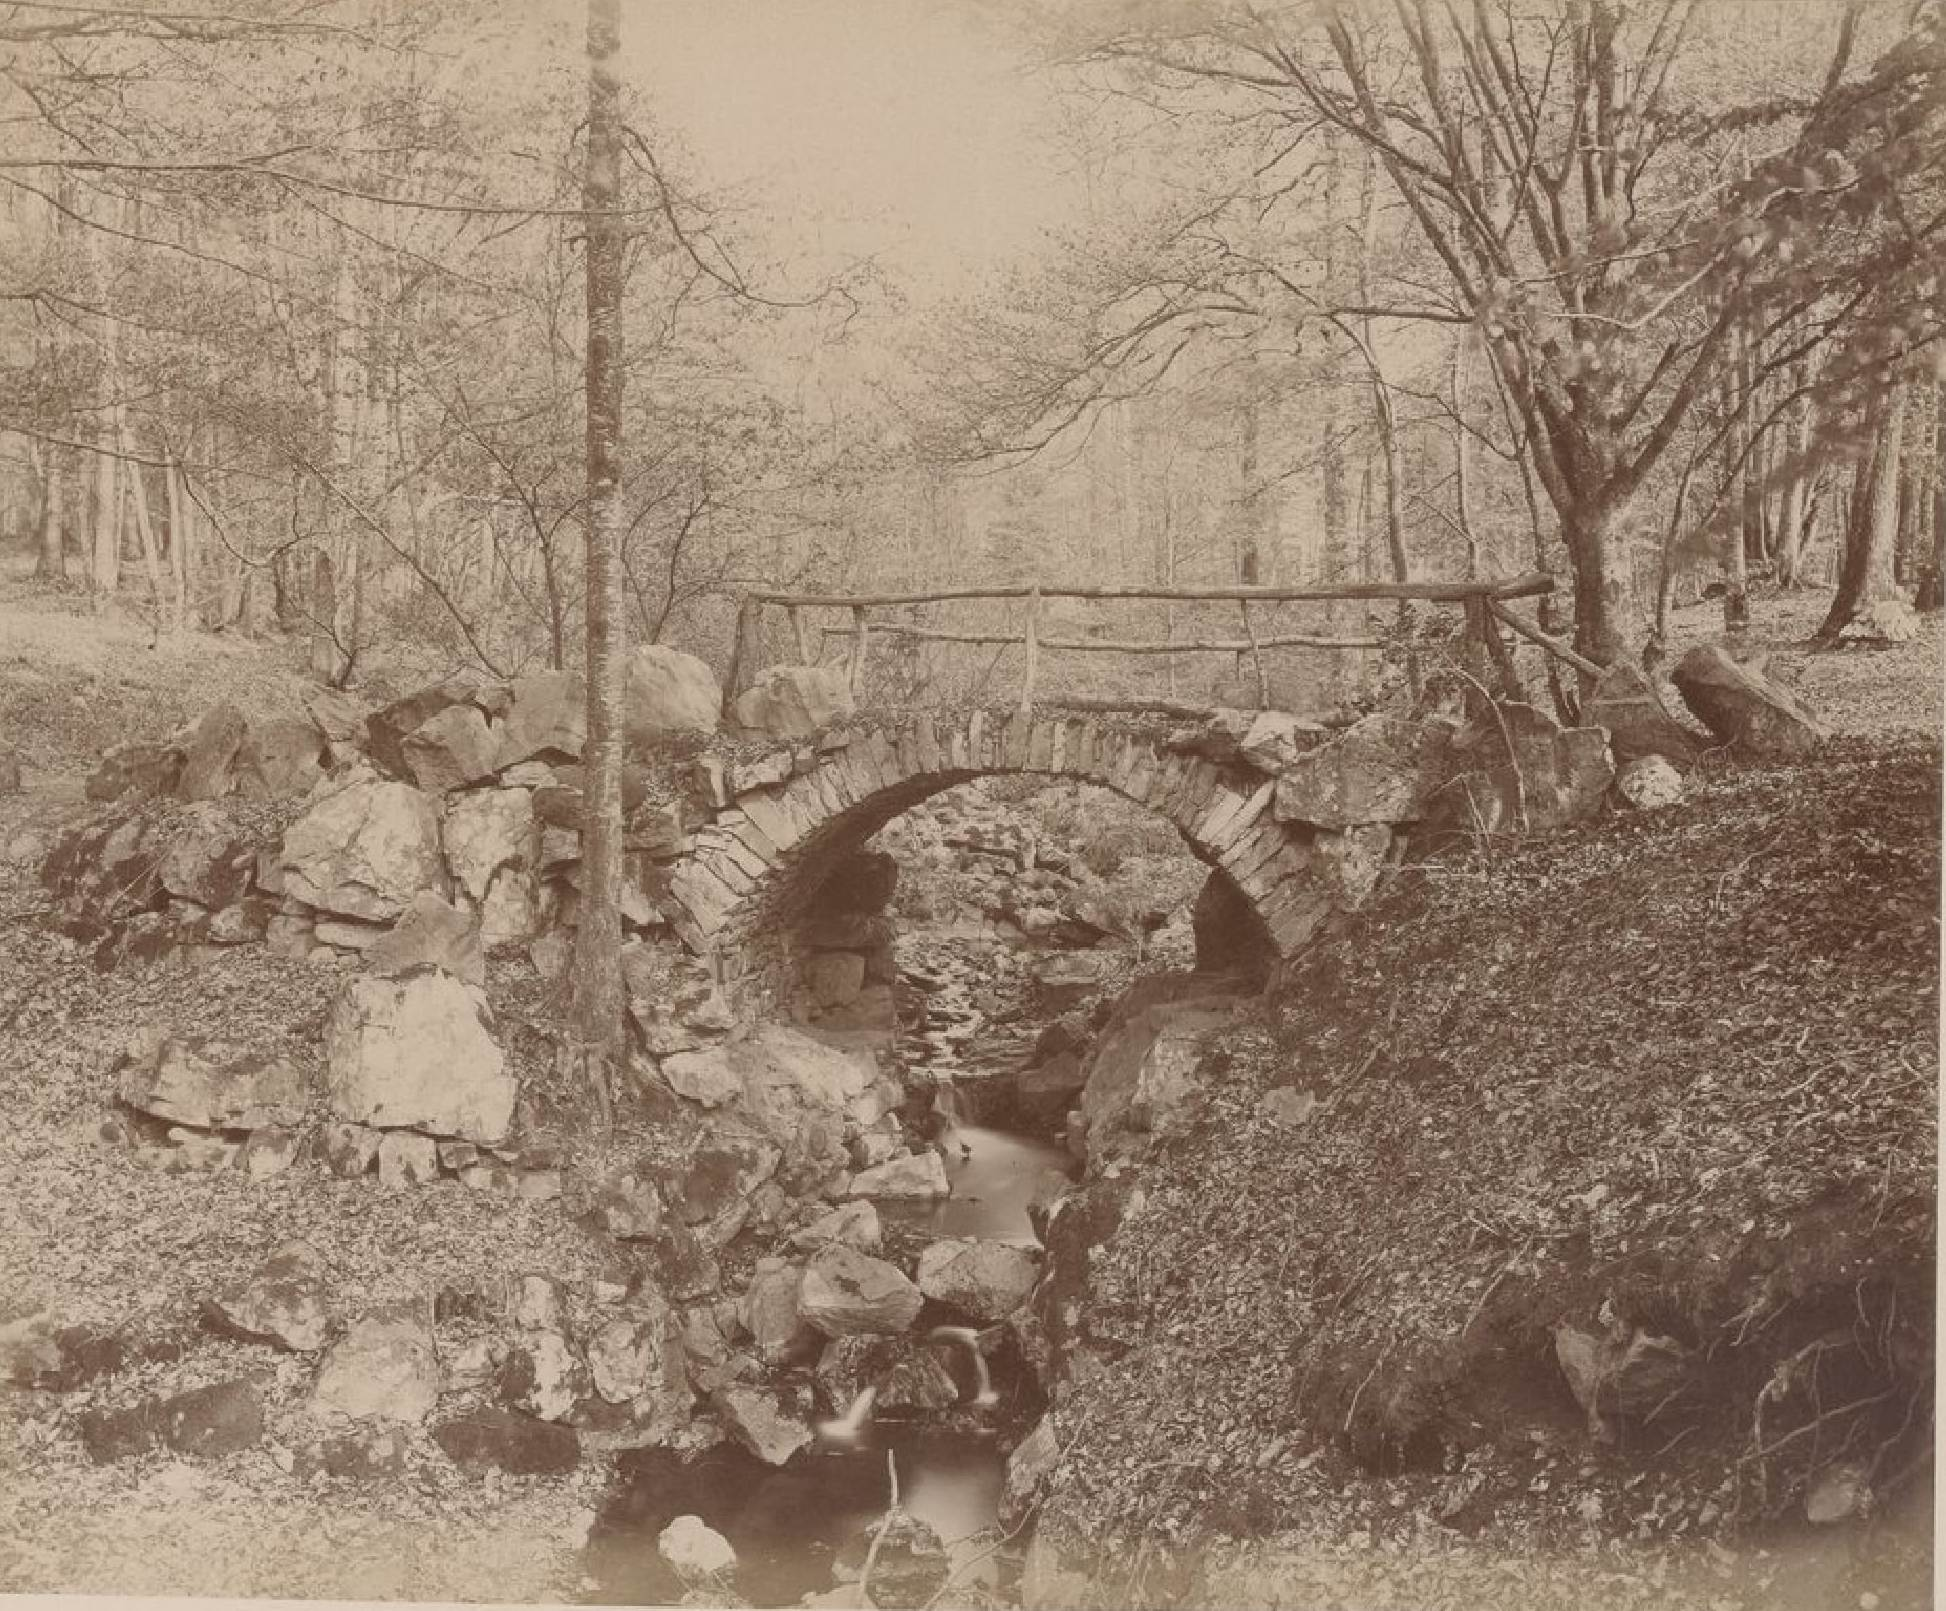 Бельгия. Спа. Променад Мейербер, 20 мая 1888